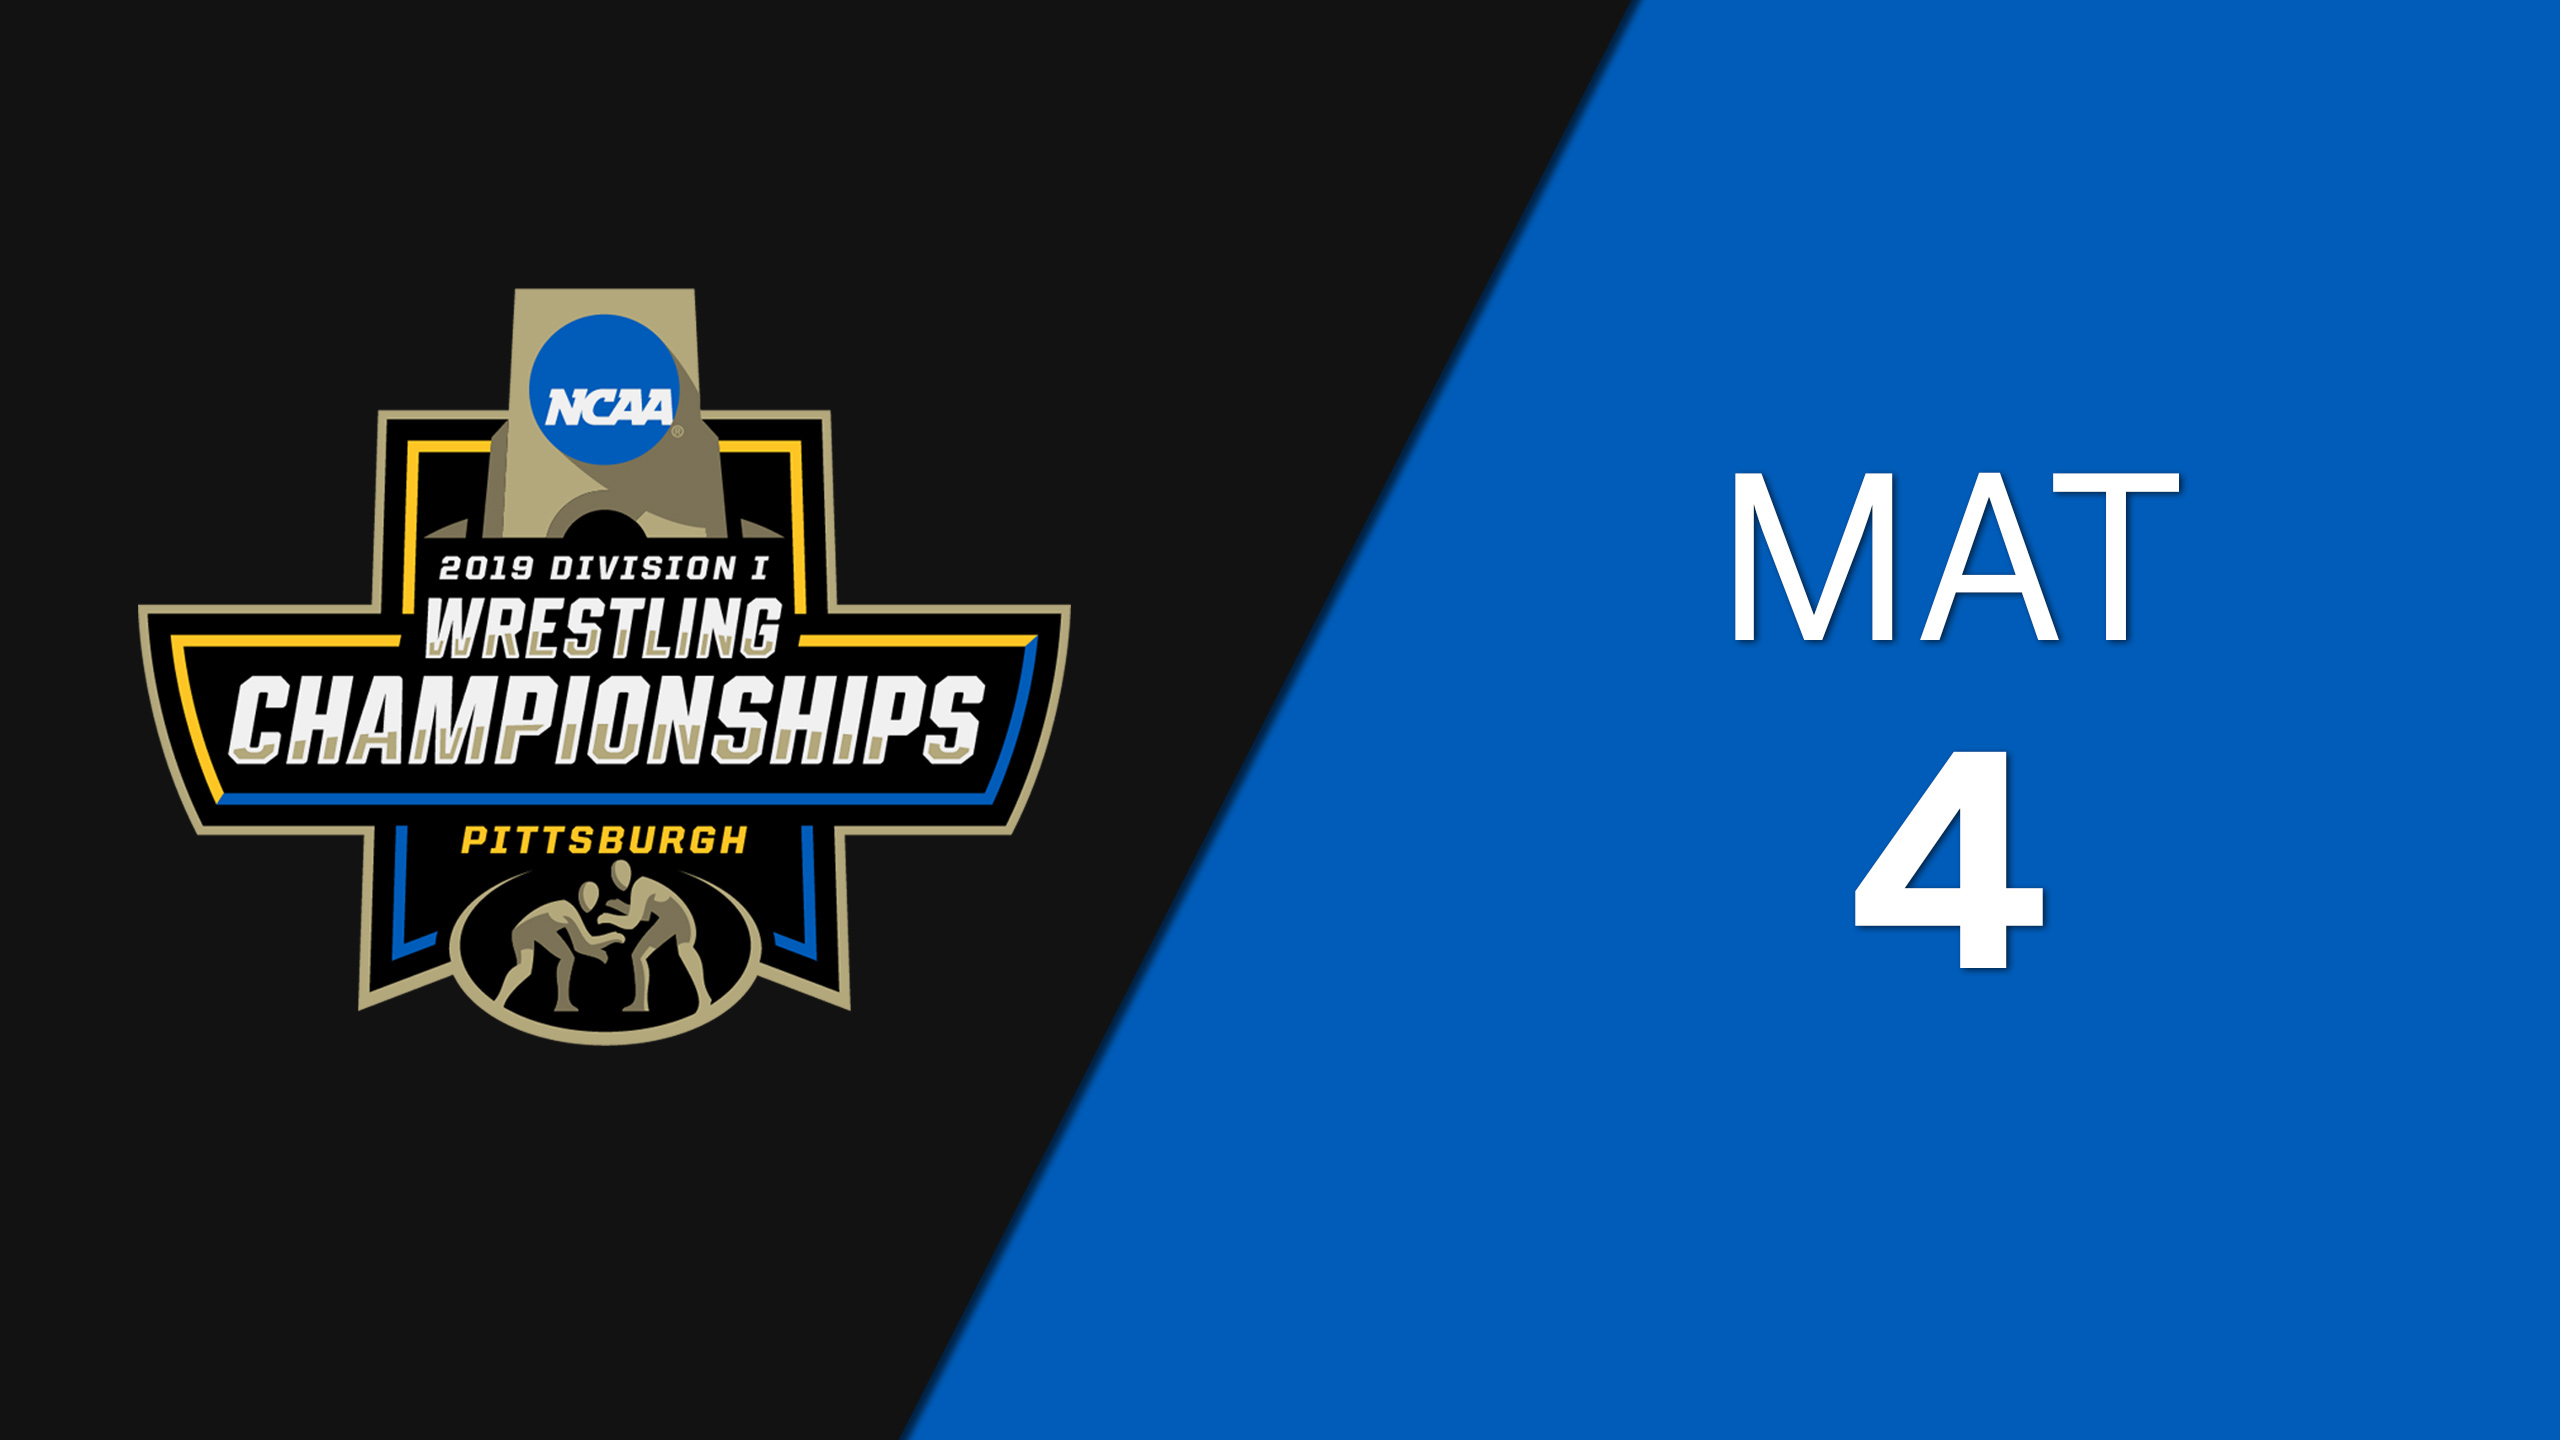 NCAA Wrestling Championship (Mat 4, Quarterfinals)